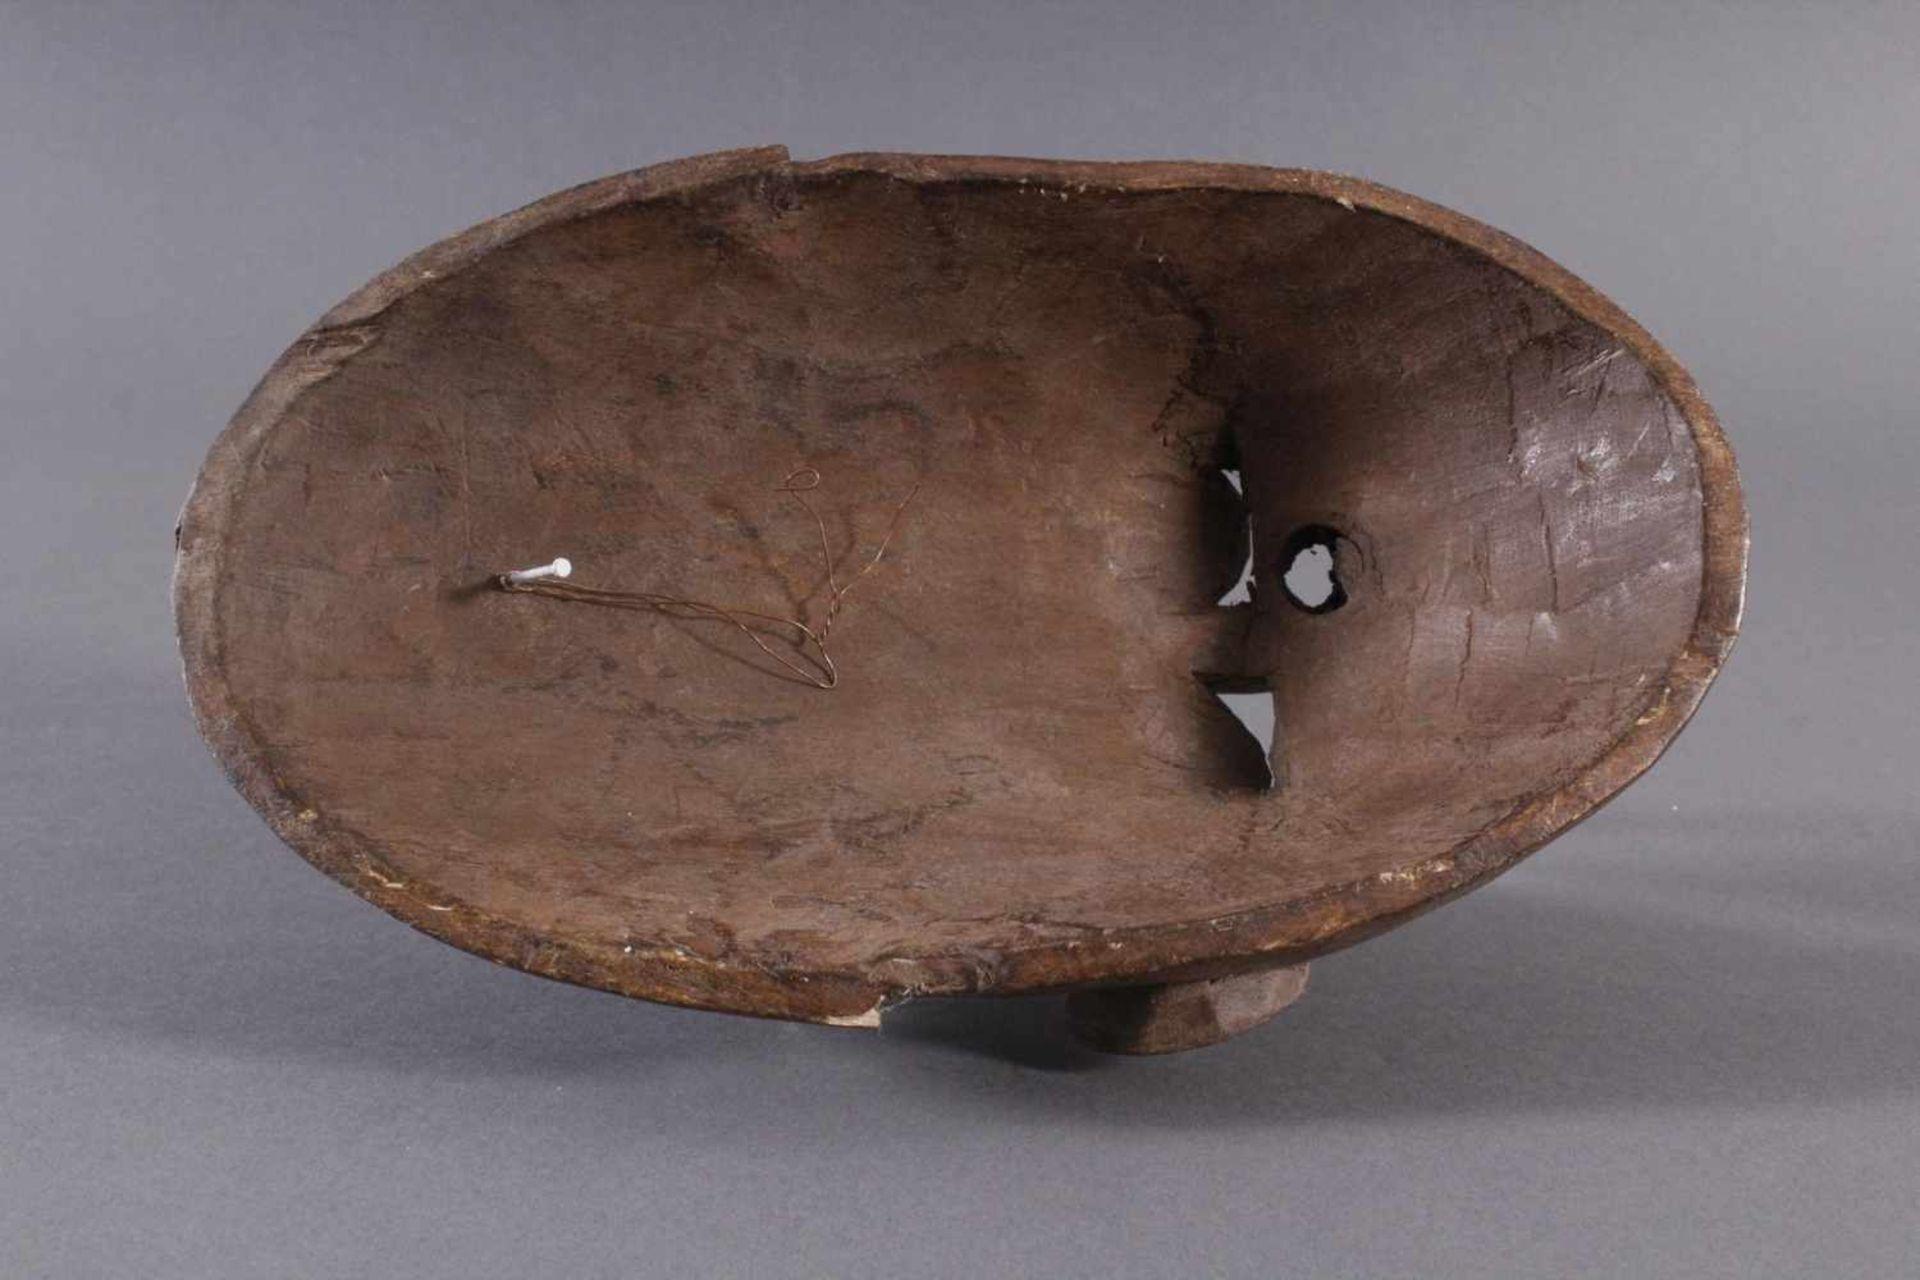 Antike Maske, Marka, Mali 1.Hälfte 19. Jh.Holz geschnitzt, Gesicht stzellenweise mit Messing-Blech - Bild 6 aus 6